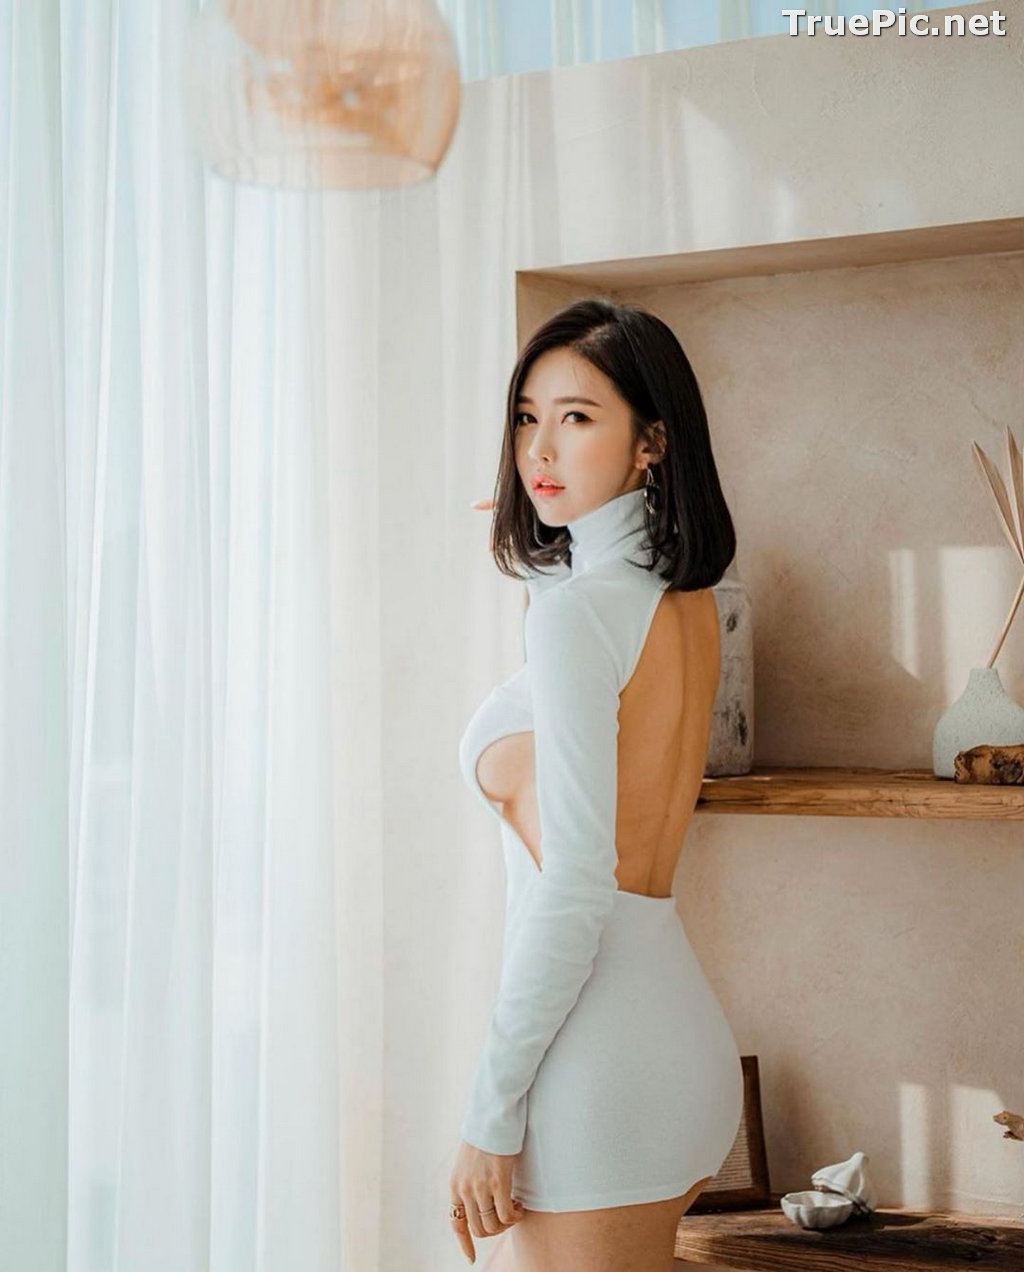 Image Korean Sexy Model - Choi Byeol Ha (최별하) Hot Photos 2020 - TruePic.net - Picture-2